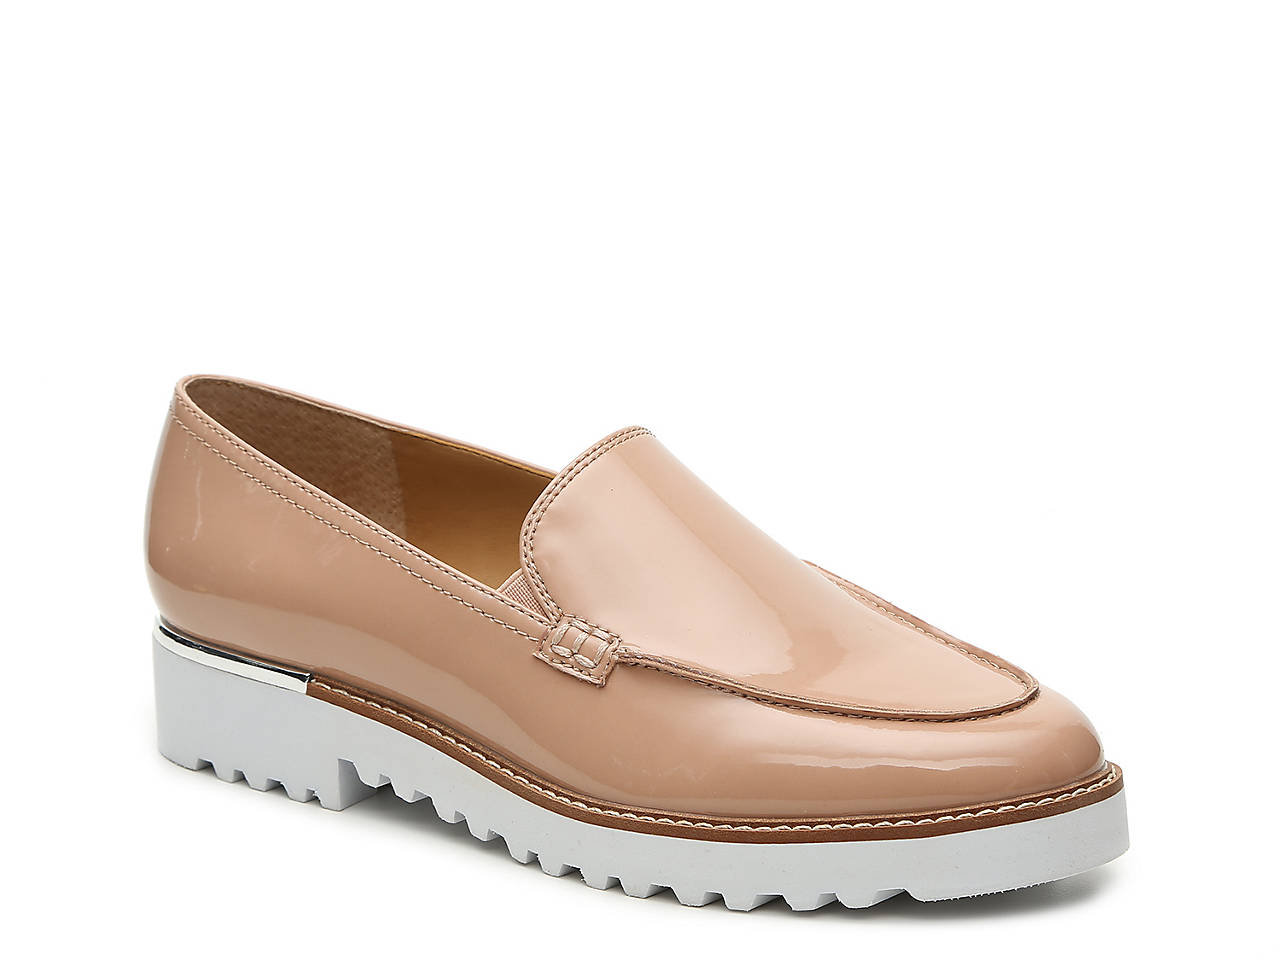 a6c05ed863 Franco Sarto Cypress Platform Loafer Women s Shoes